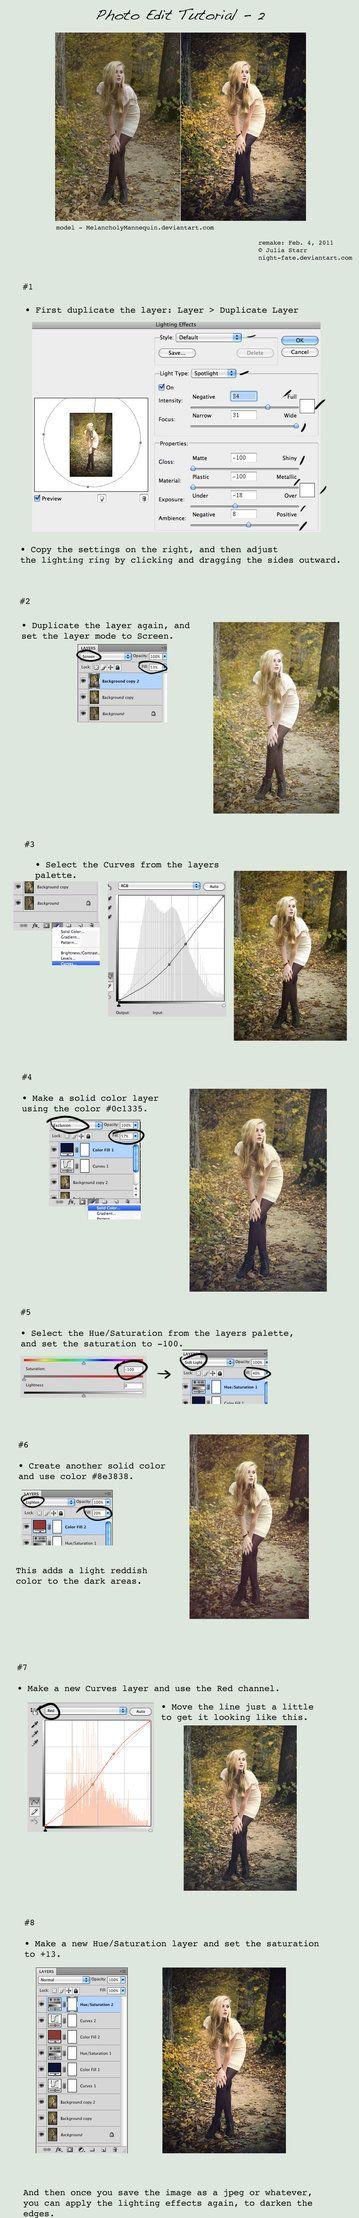 Lots of Photoshop editing tutorials